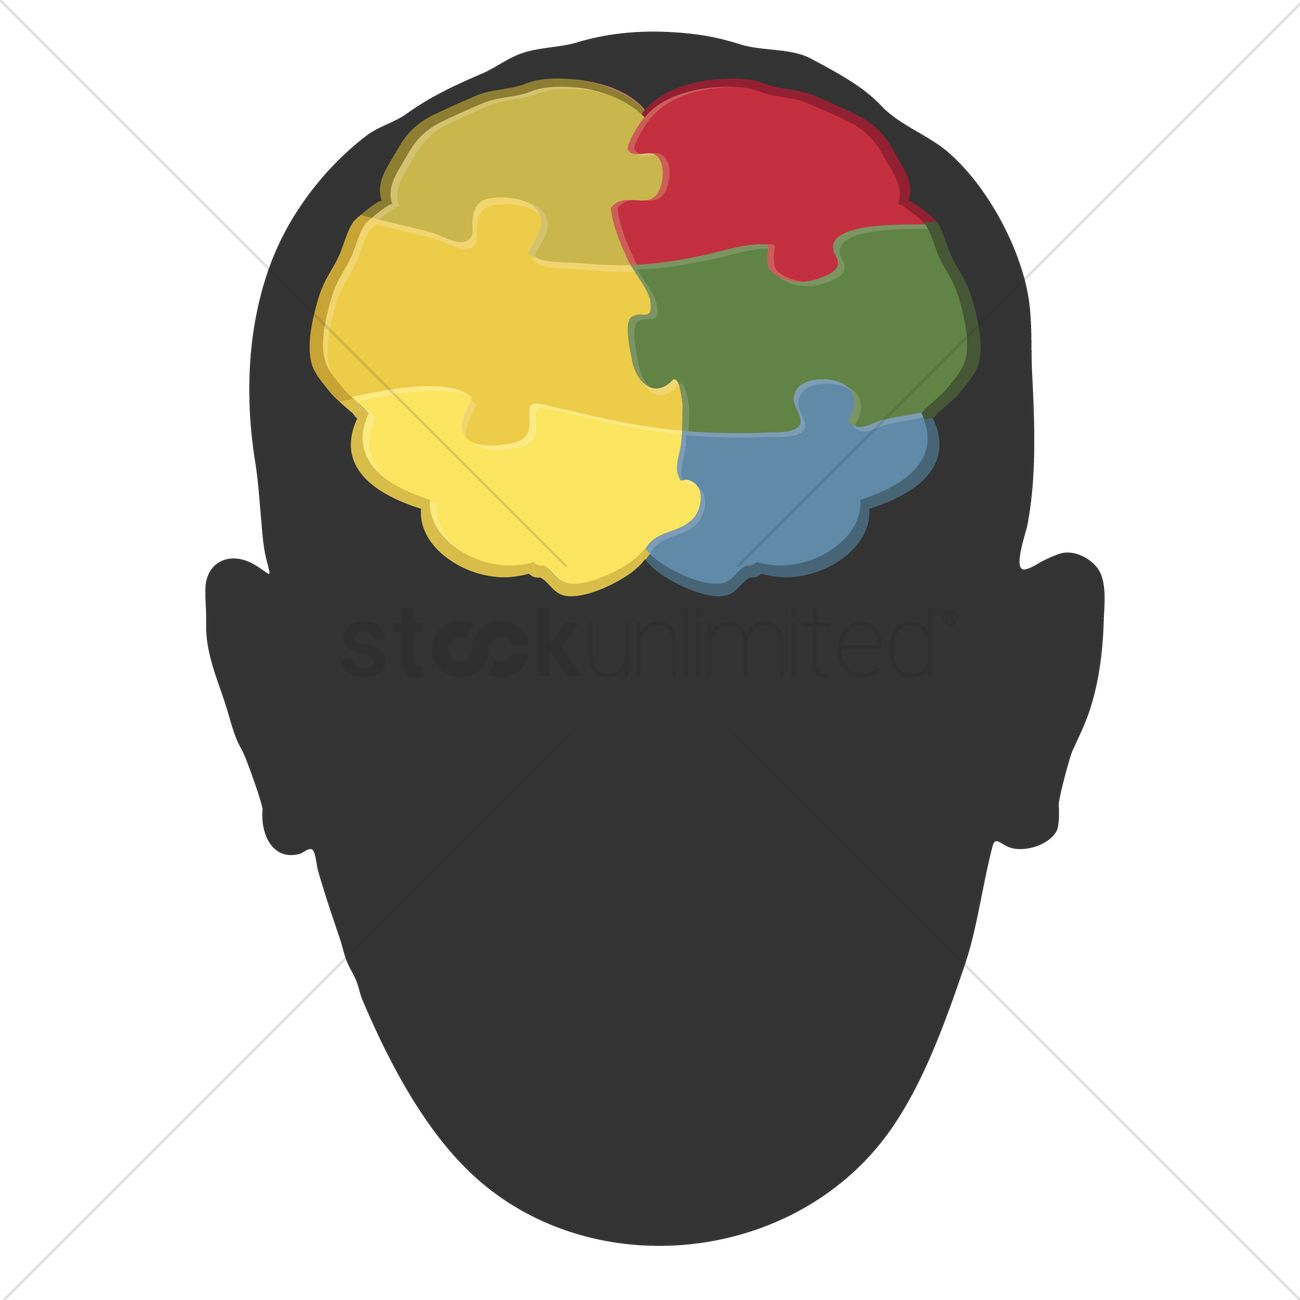 1300x1300 Human Head Silhouette With Brain Art Vector Image